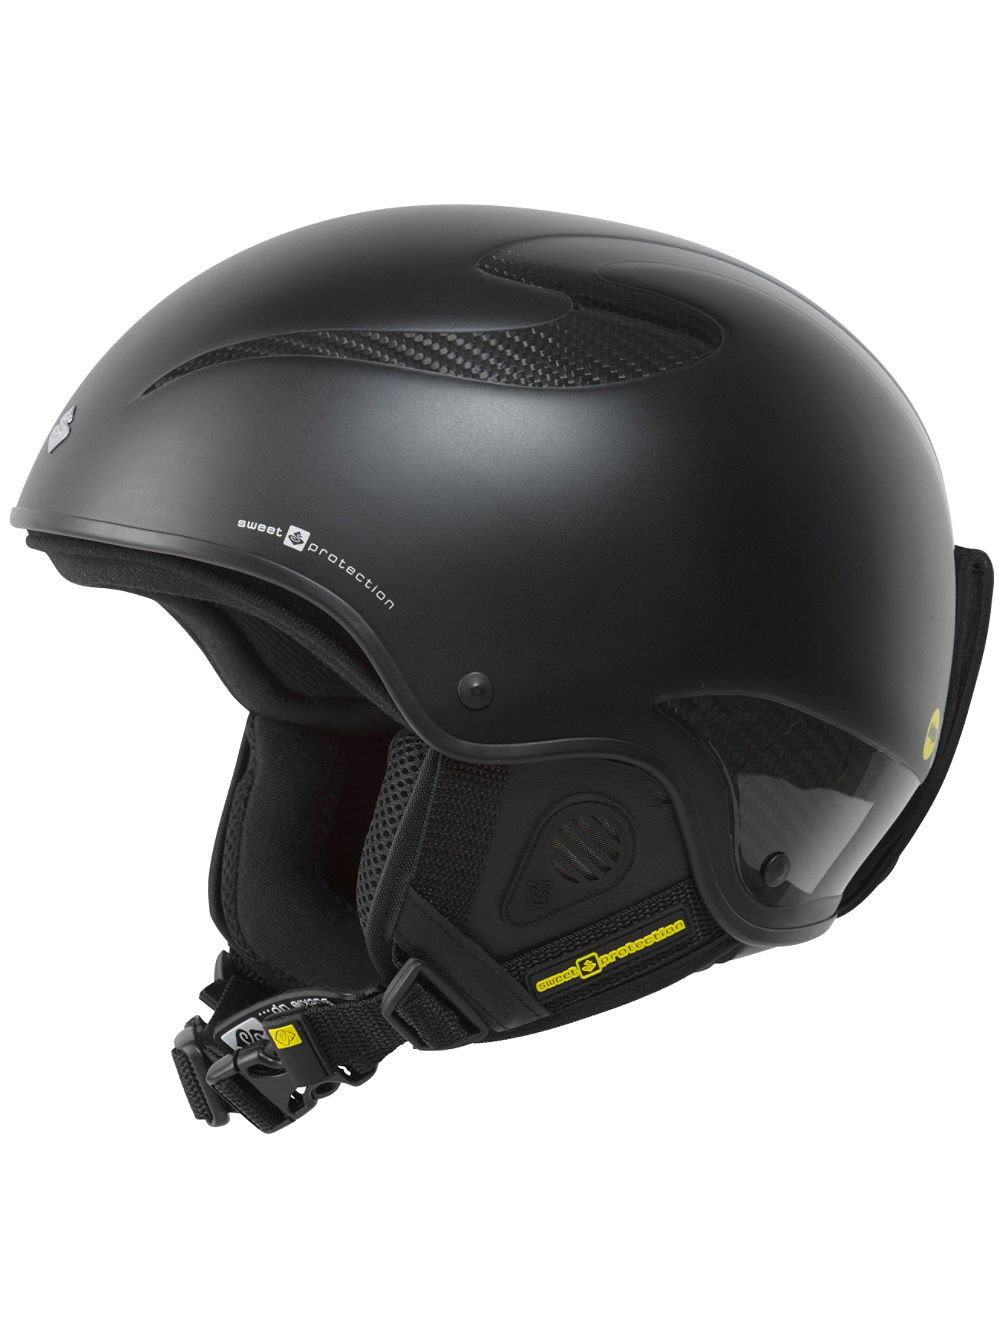 rooster-helmet